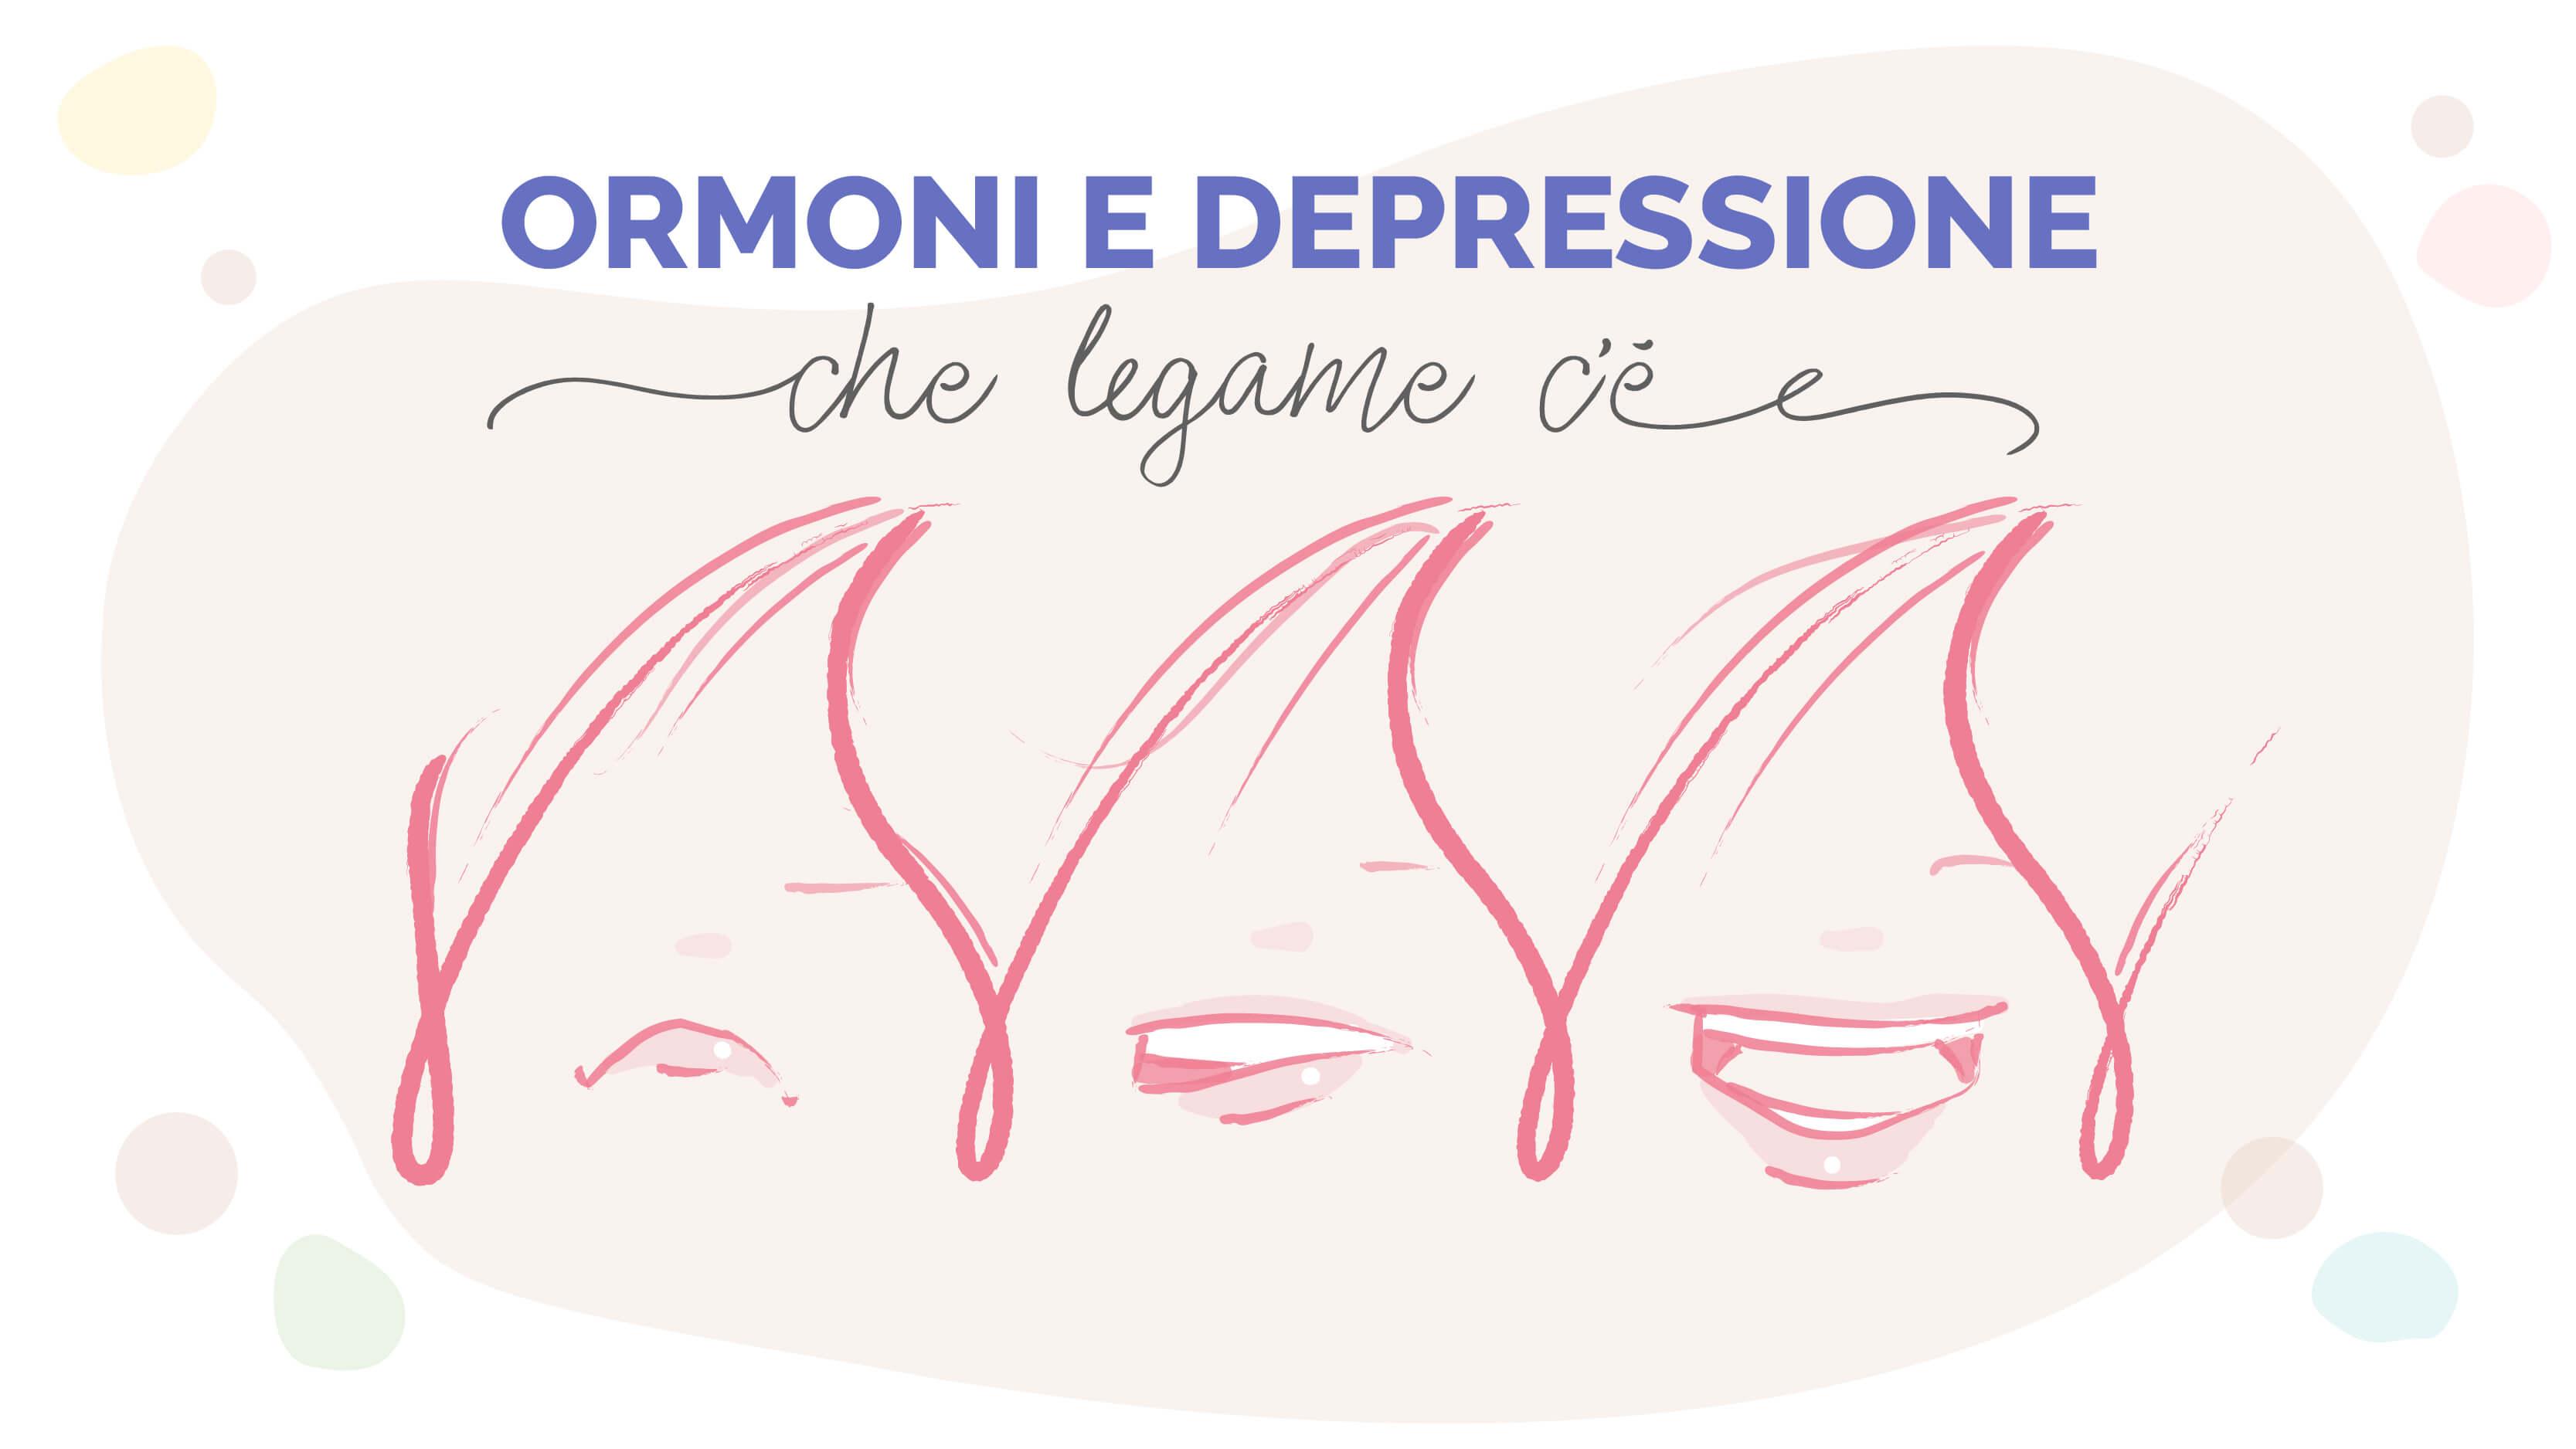 ormoni-depressione